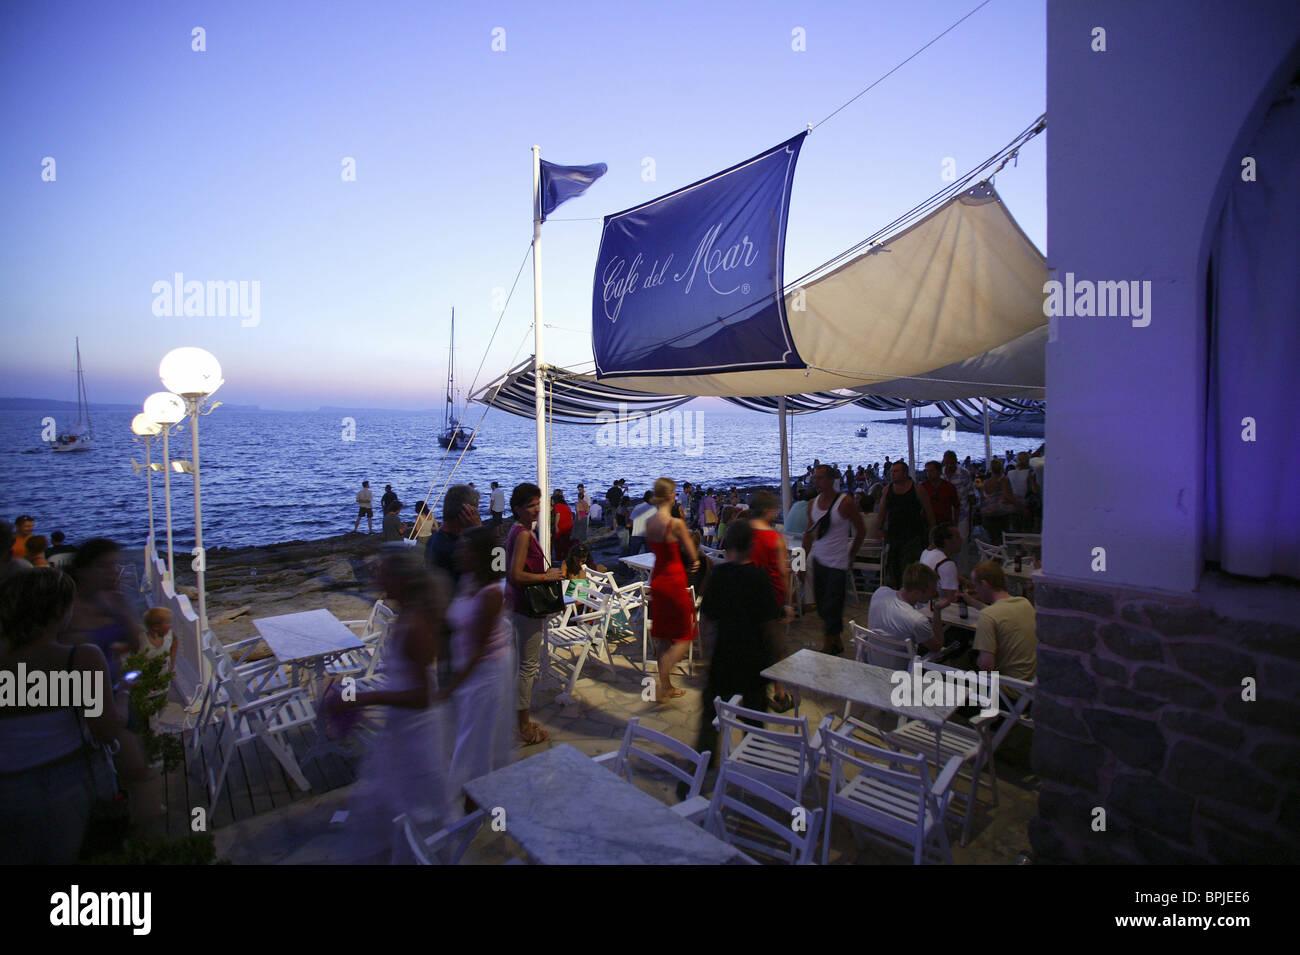 Evening mood at Café del Mar Ibiza, Balearic Island, Spain - Stock Image